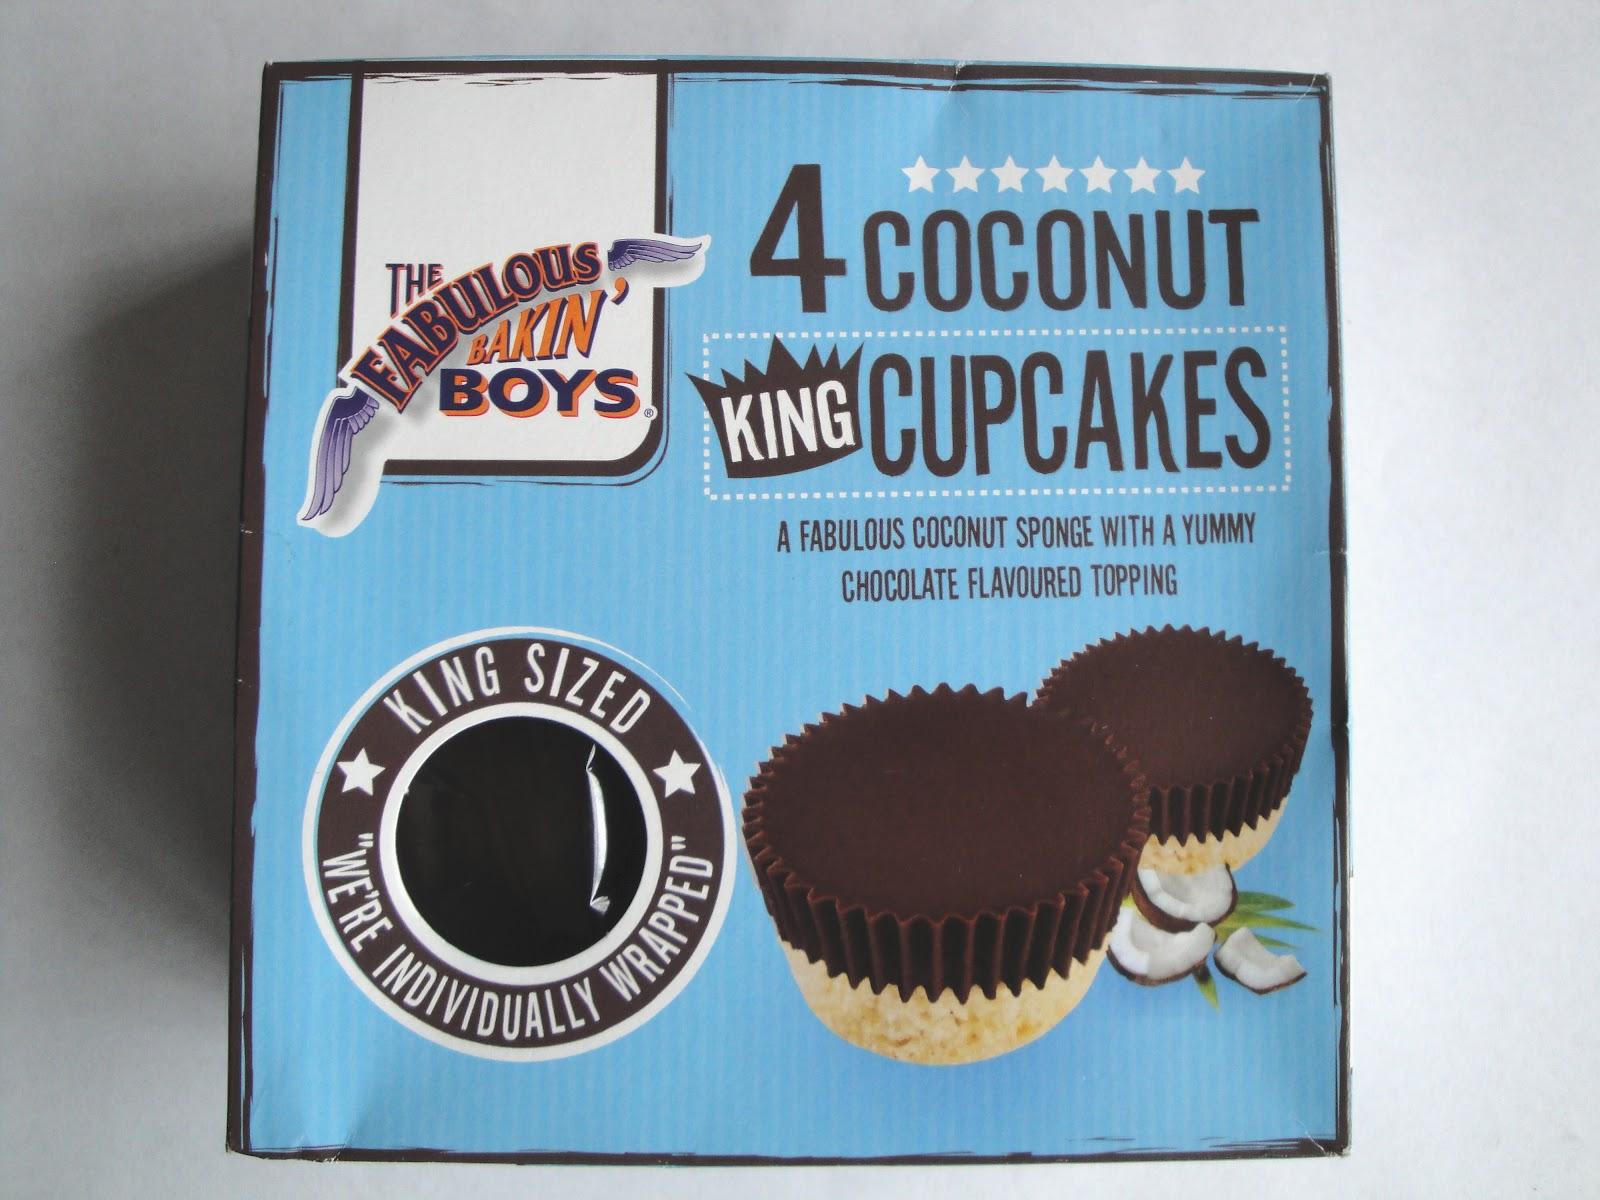 grocery gems fabulous bakin 39 boys 4 coconut king cupcakes. Black Bedroom Furniture Sets. Home Design Ideas